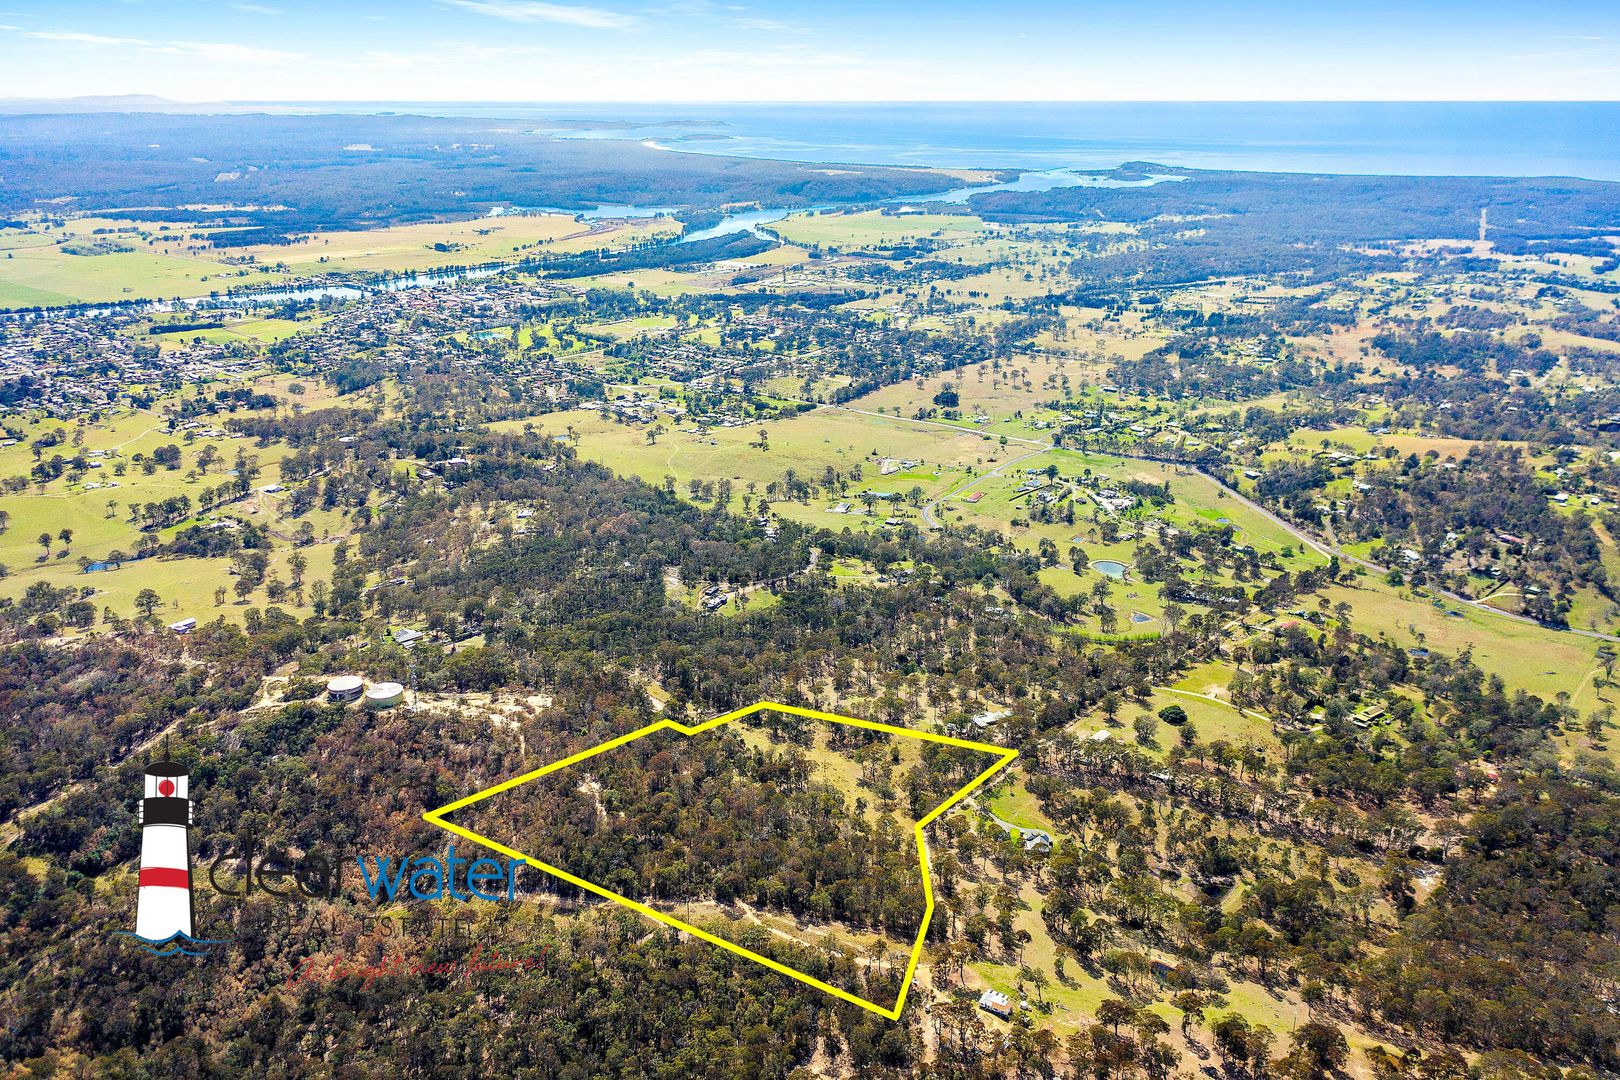 Lot/280 Summerhill Road, Moruya NSW 2537, Image 0